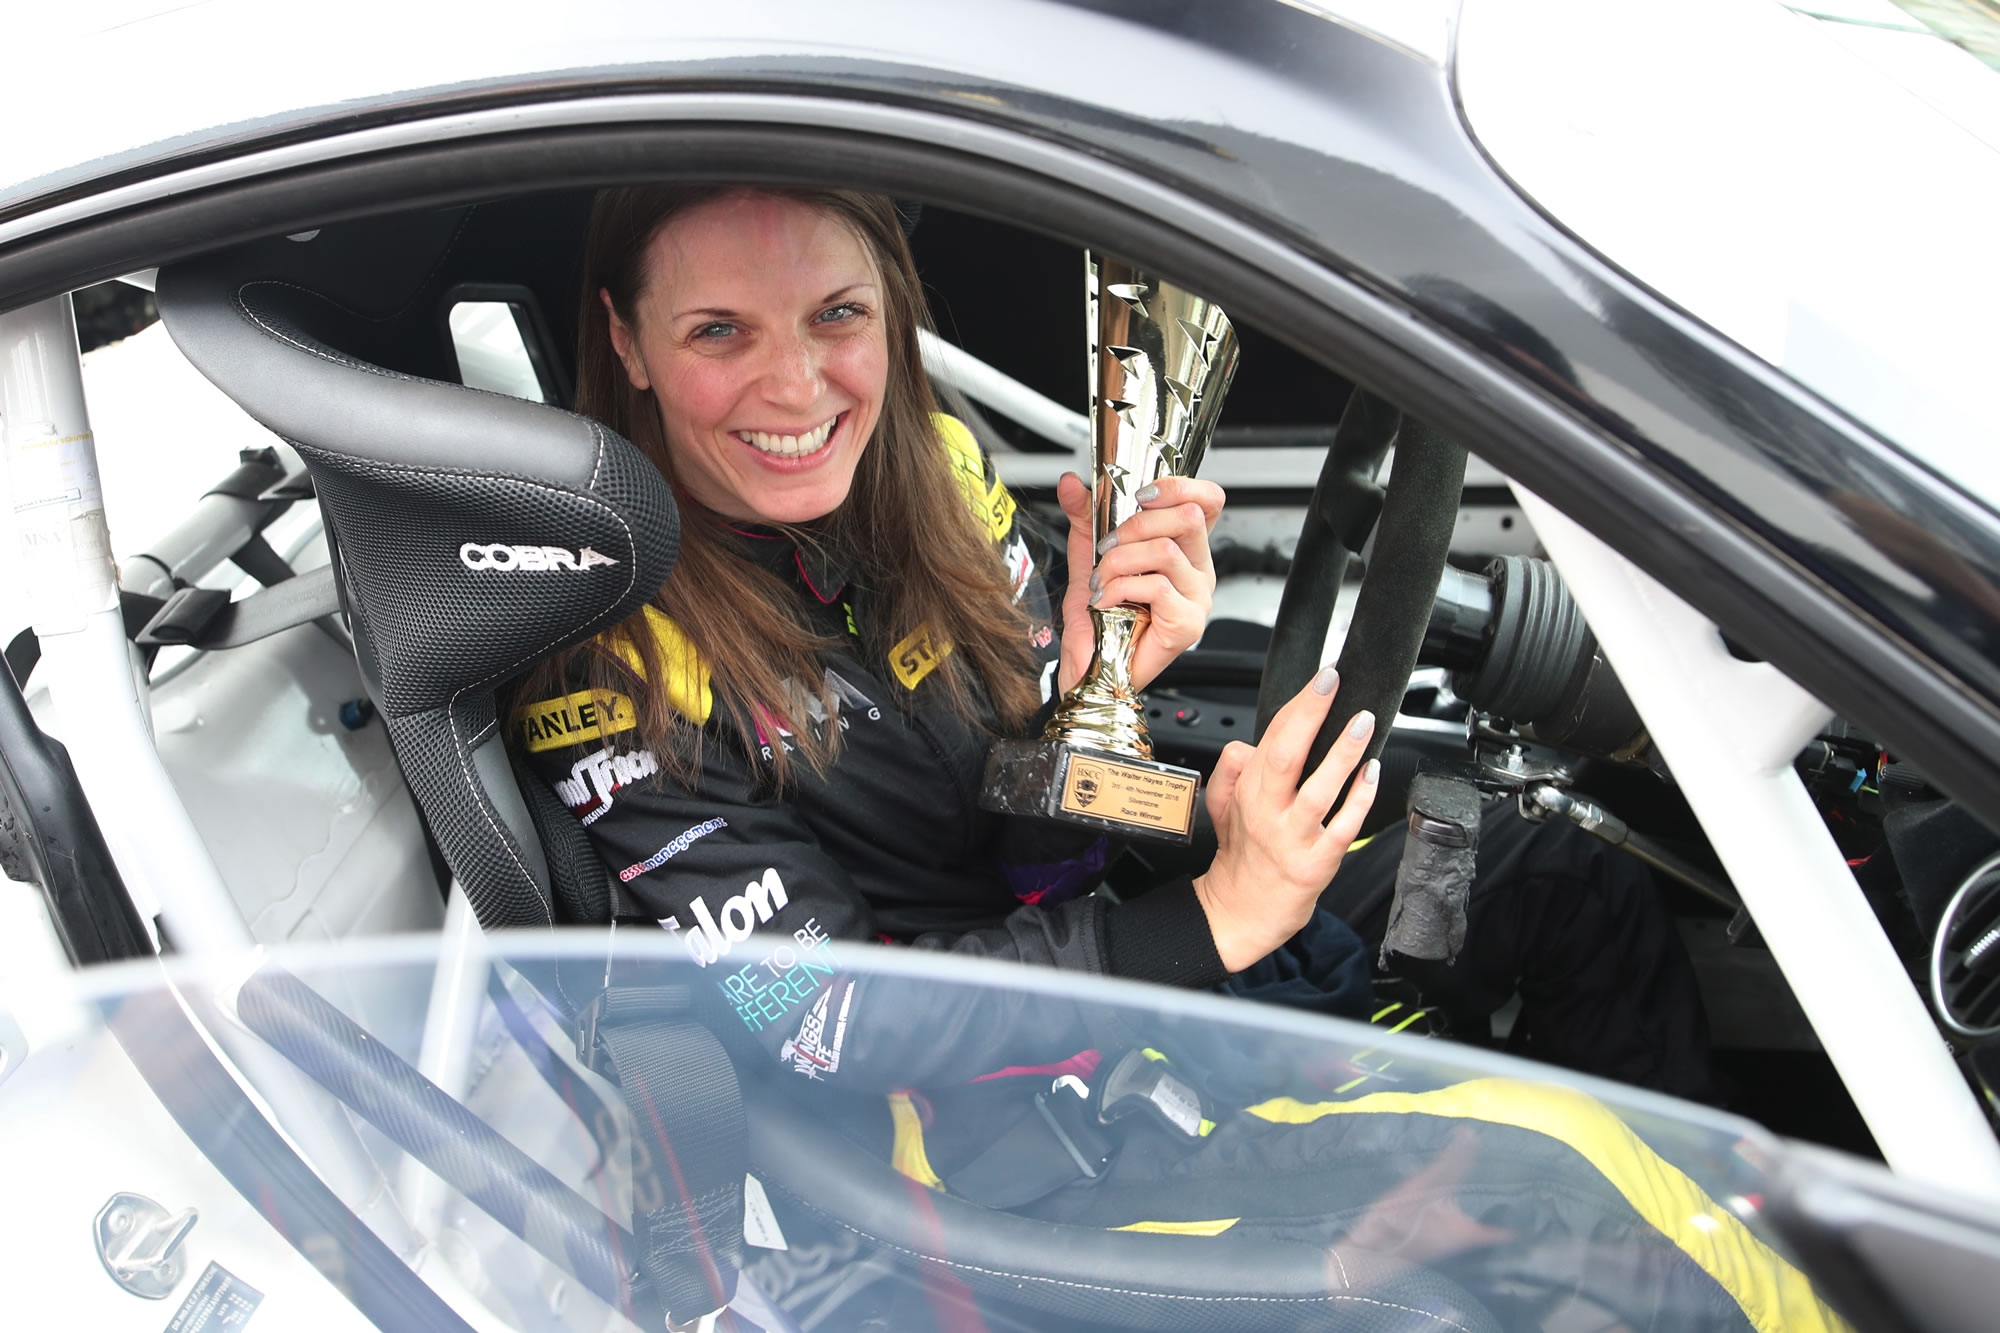 Nathalie_McGloin_Racer_Silverstone_BWRDC_Race.jpg